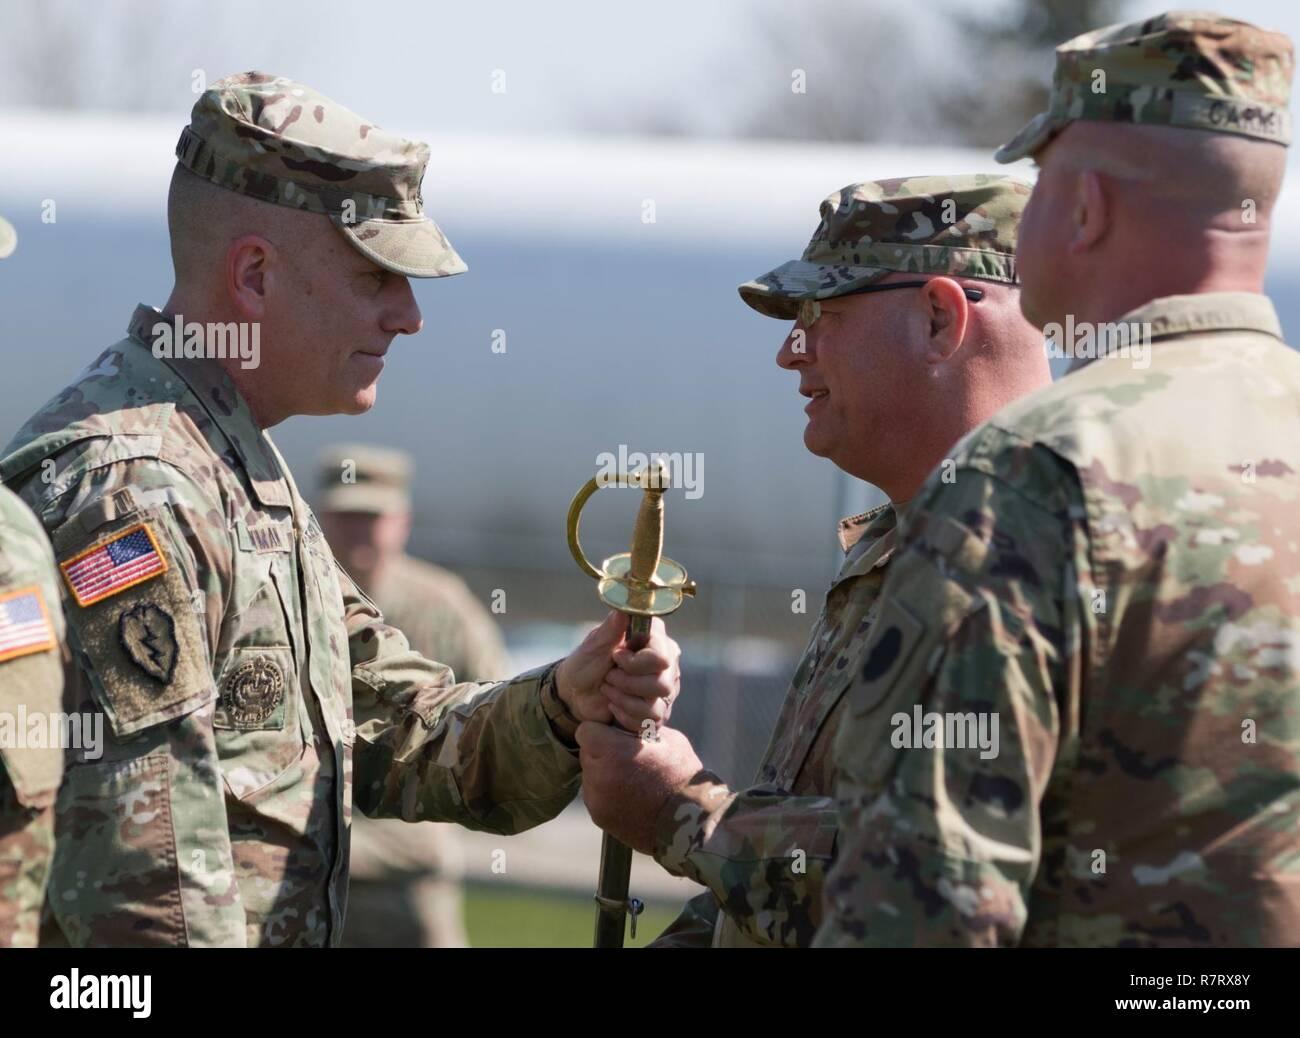 Command Sgt  Maj  Mark W  Bowman of Plainfield, Illinois